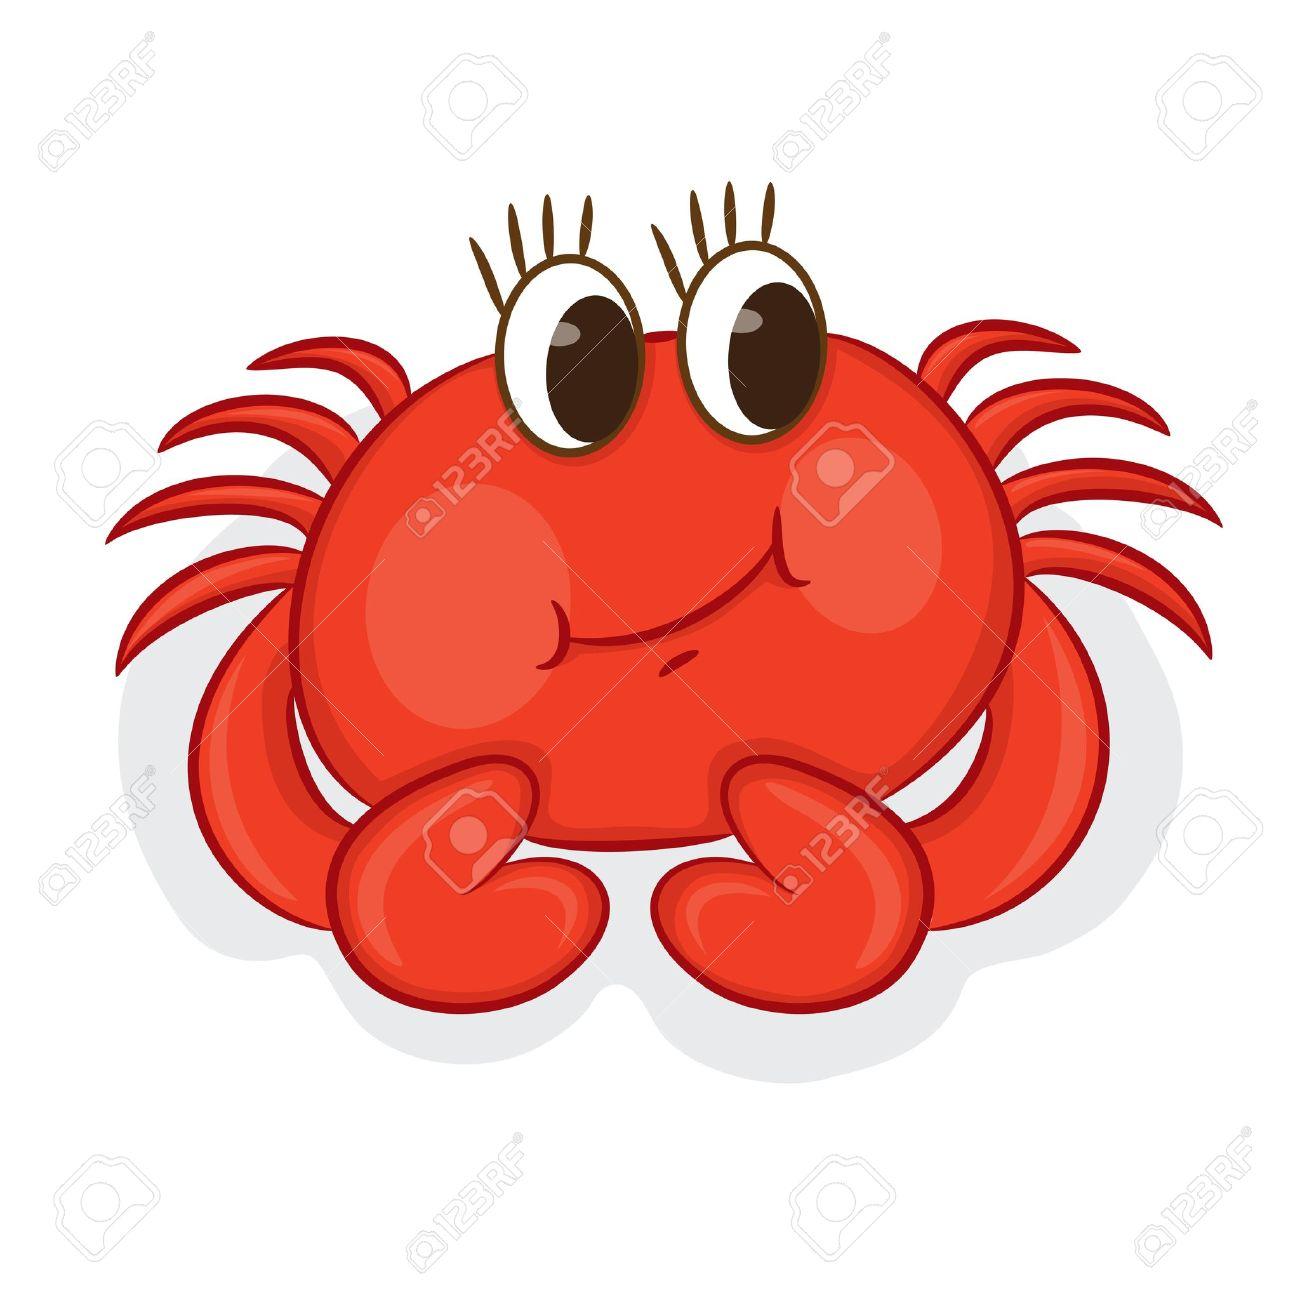 1300x1300 Cartoon Crab Vector Illustration Royalty Free Cliparts, Vectors